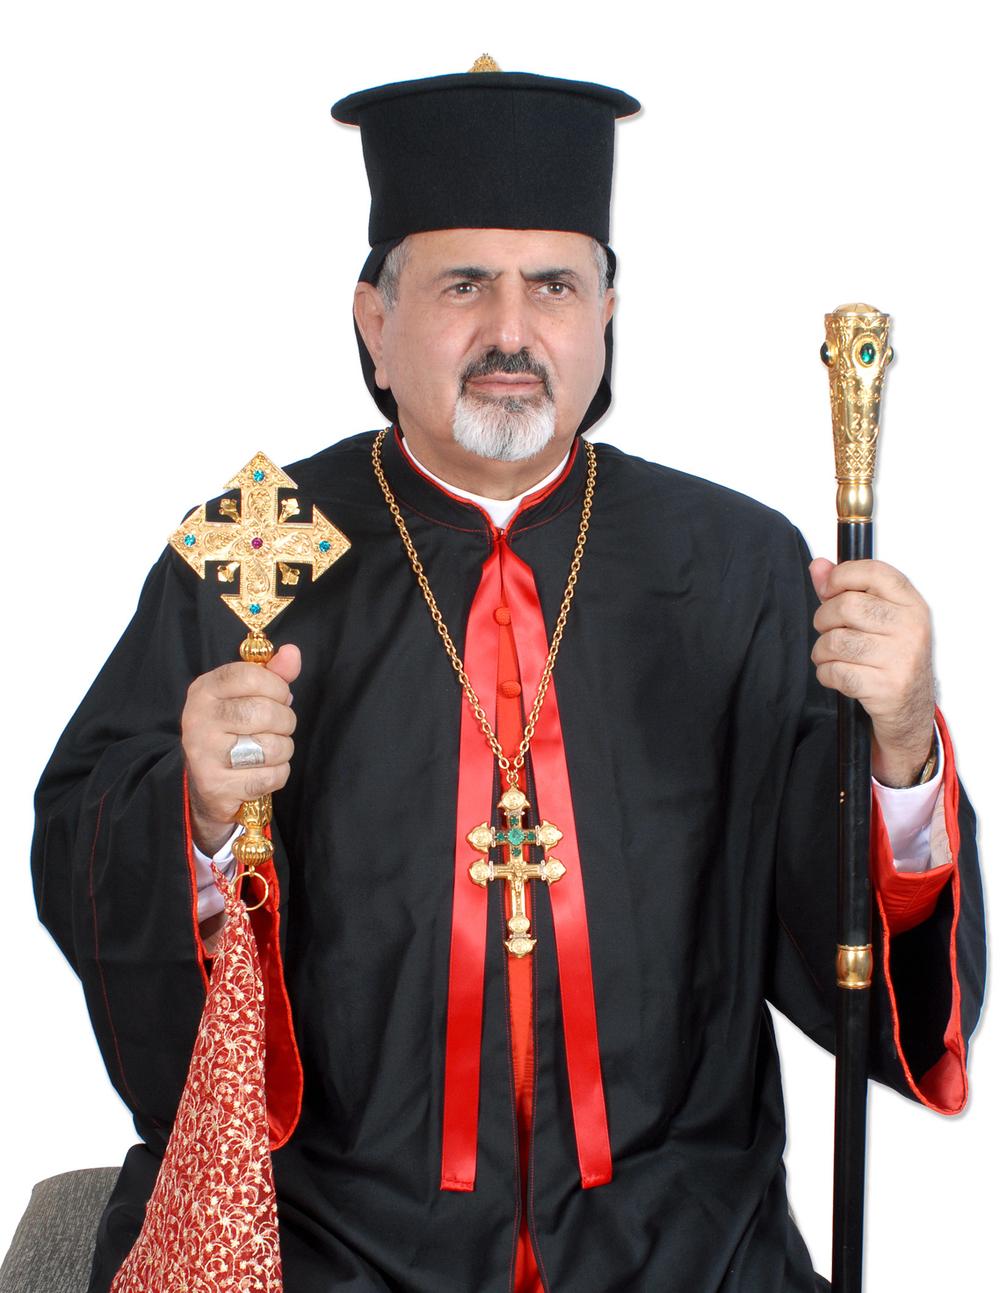 Ignatius Joseph III Yonan Patriarch of Antioch